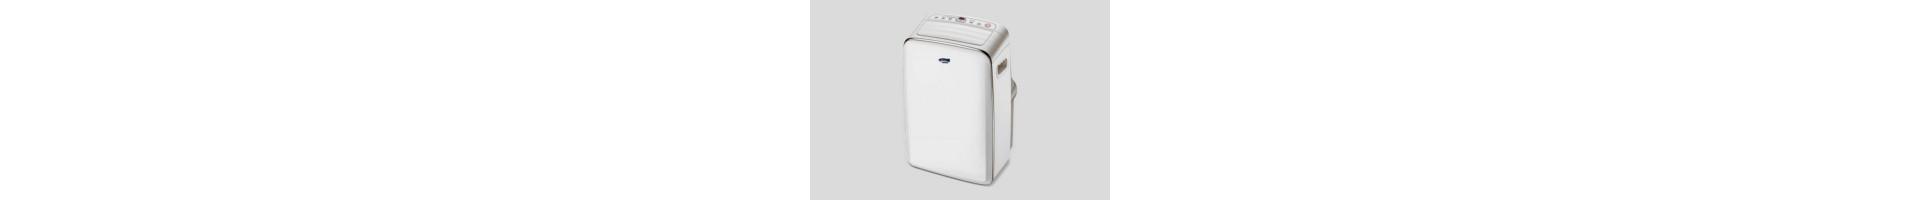 climatizzatore portatile - 12000 BTU